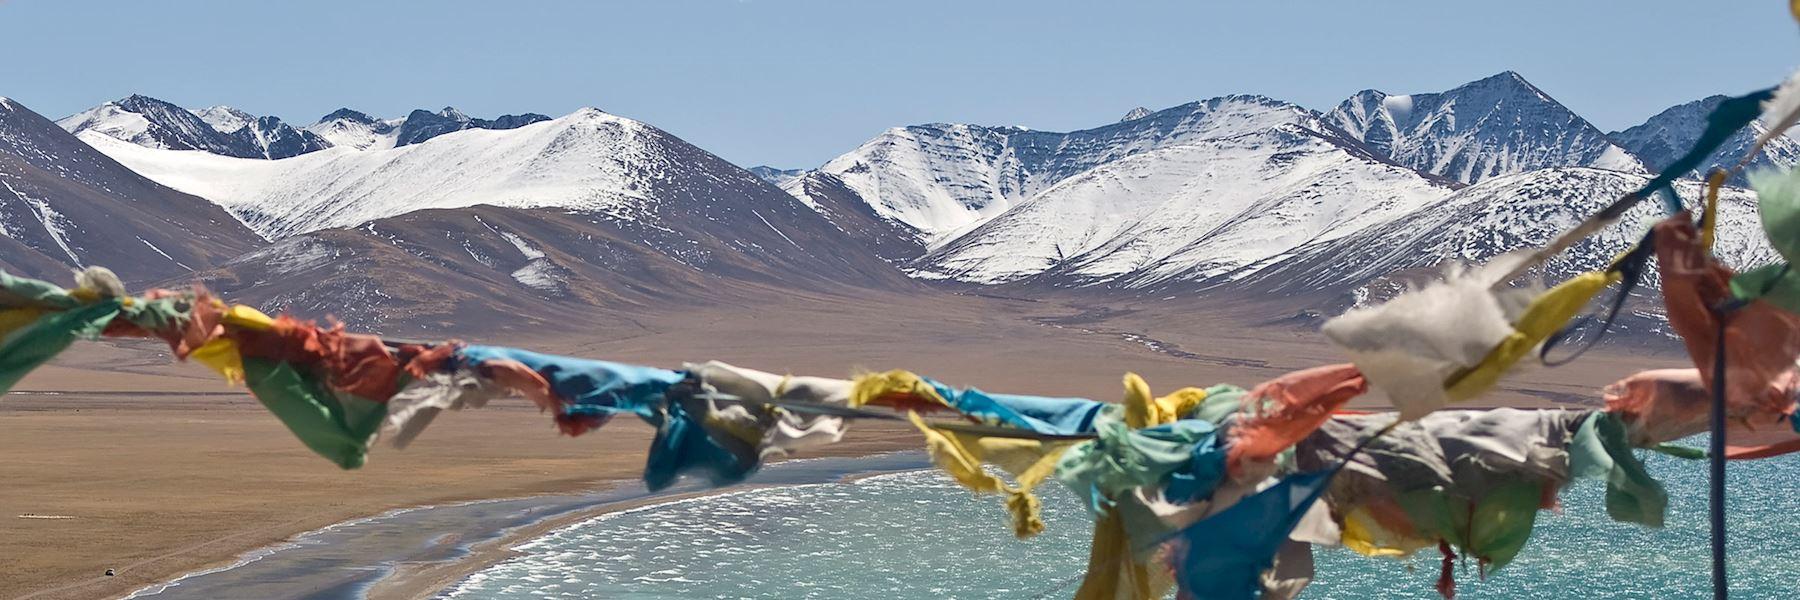 Tibet holidays  2019 & 2020